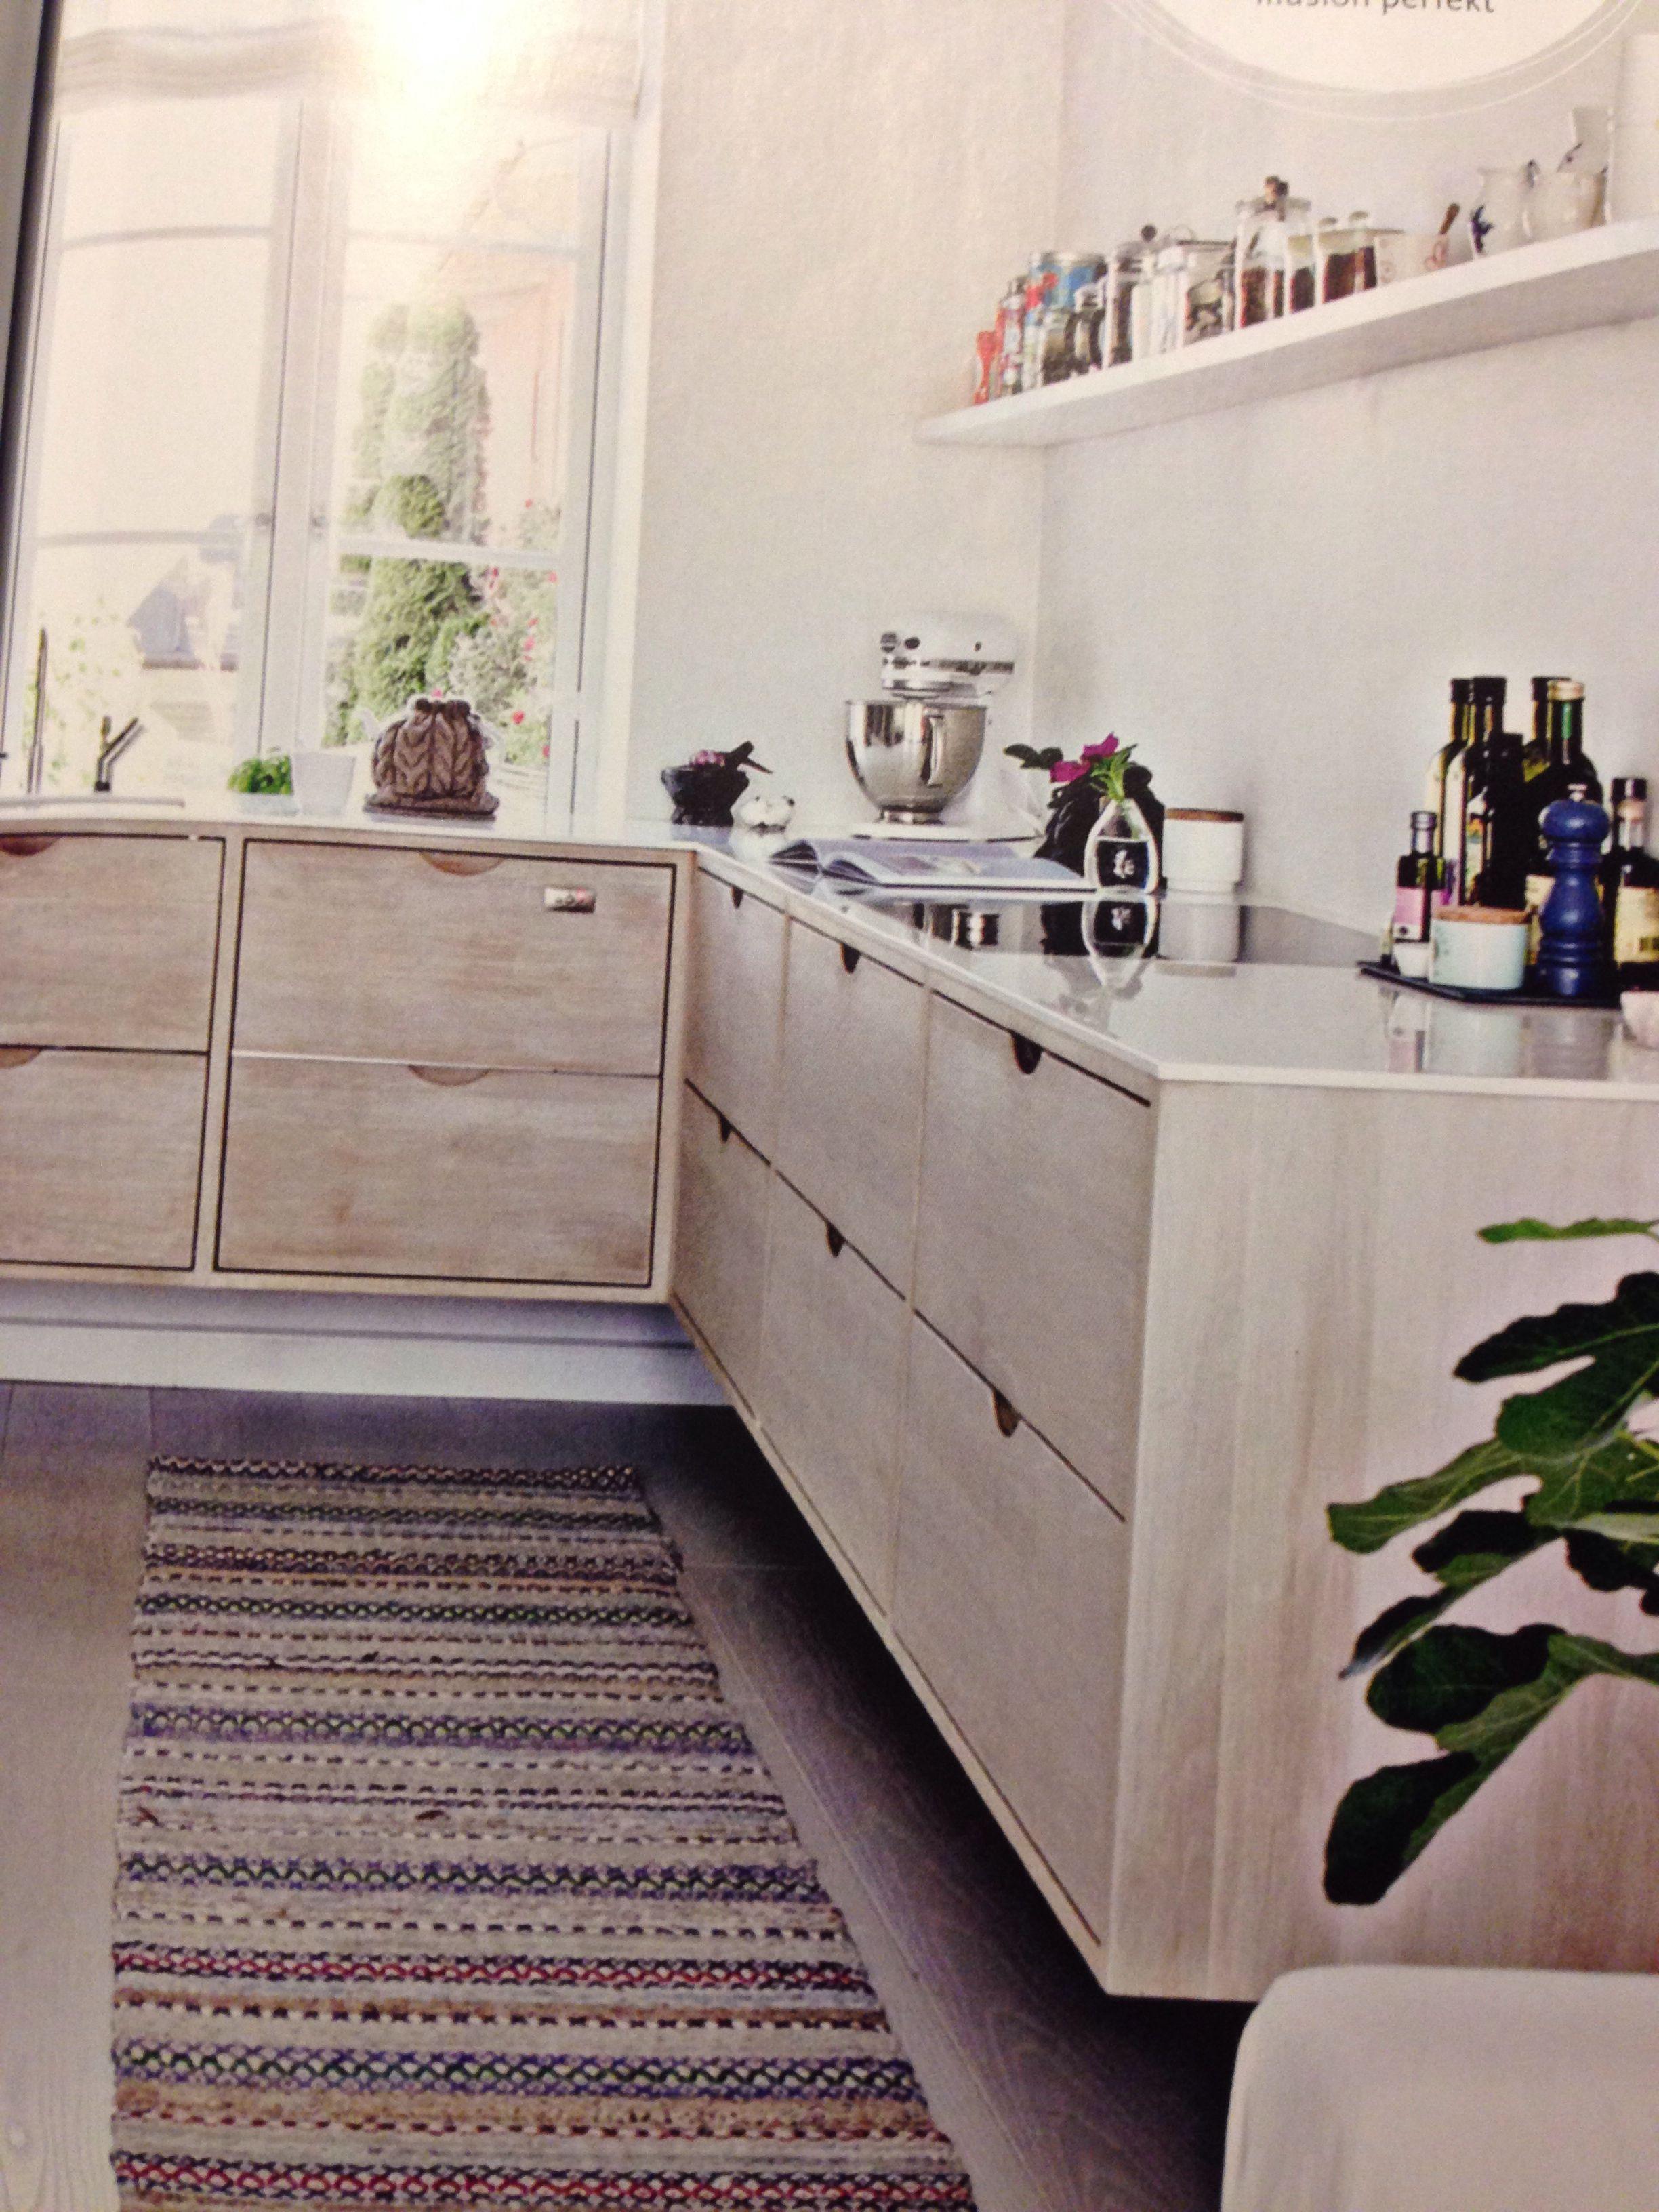 k che sockelblende ecke ikea k che sockelleiste ecke k che sockelleiste imagenesdesalud. Black Bedroom Furniture Sets. Home Design Ideas